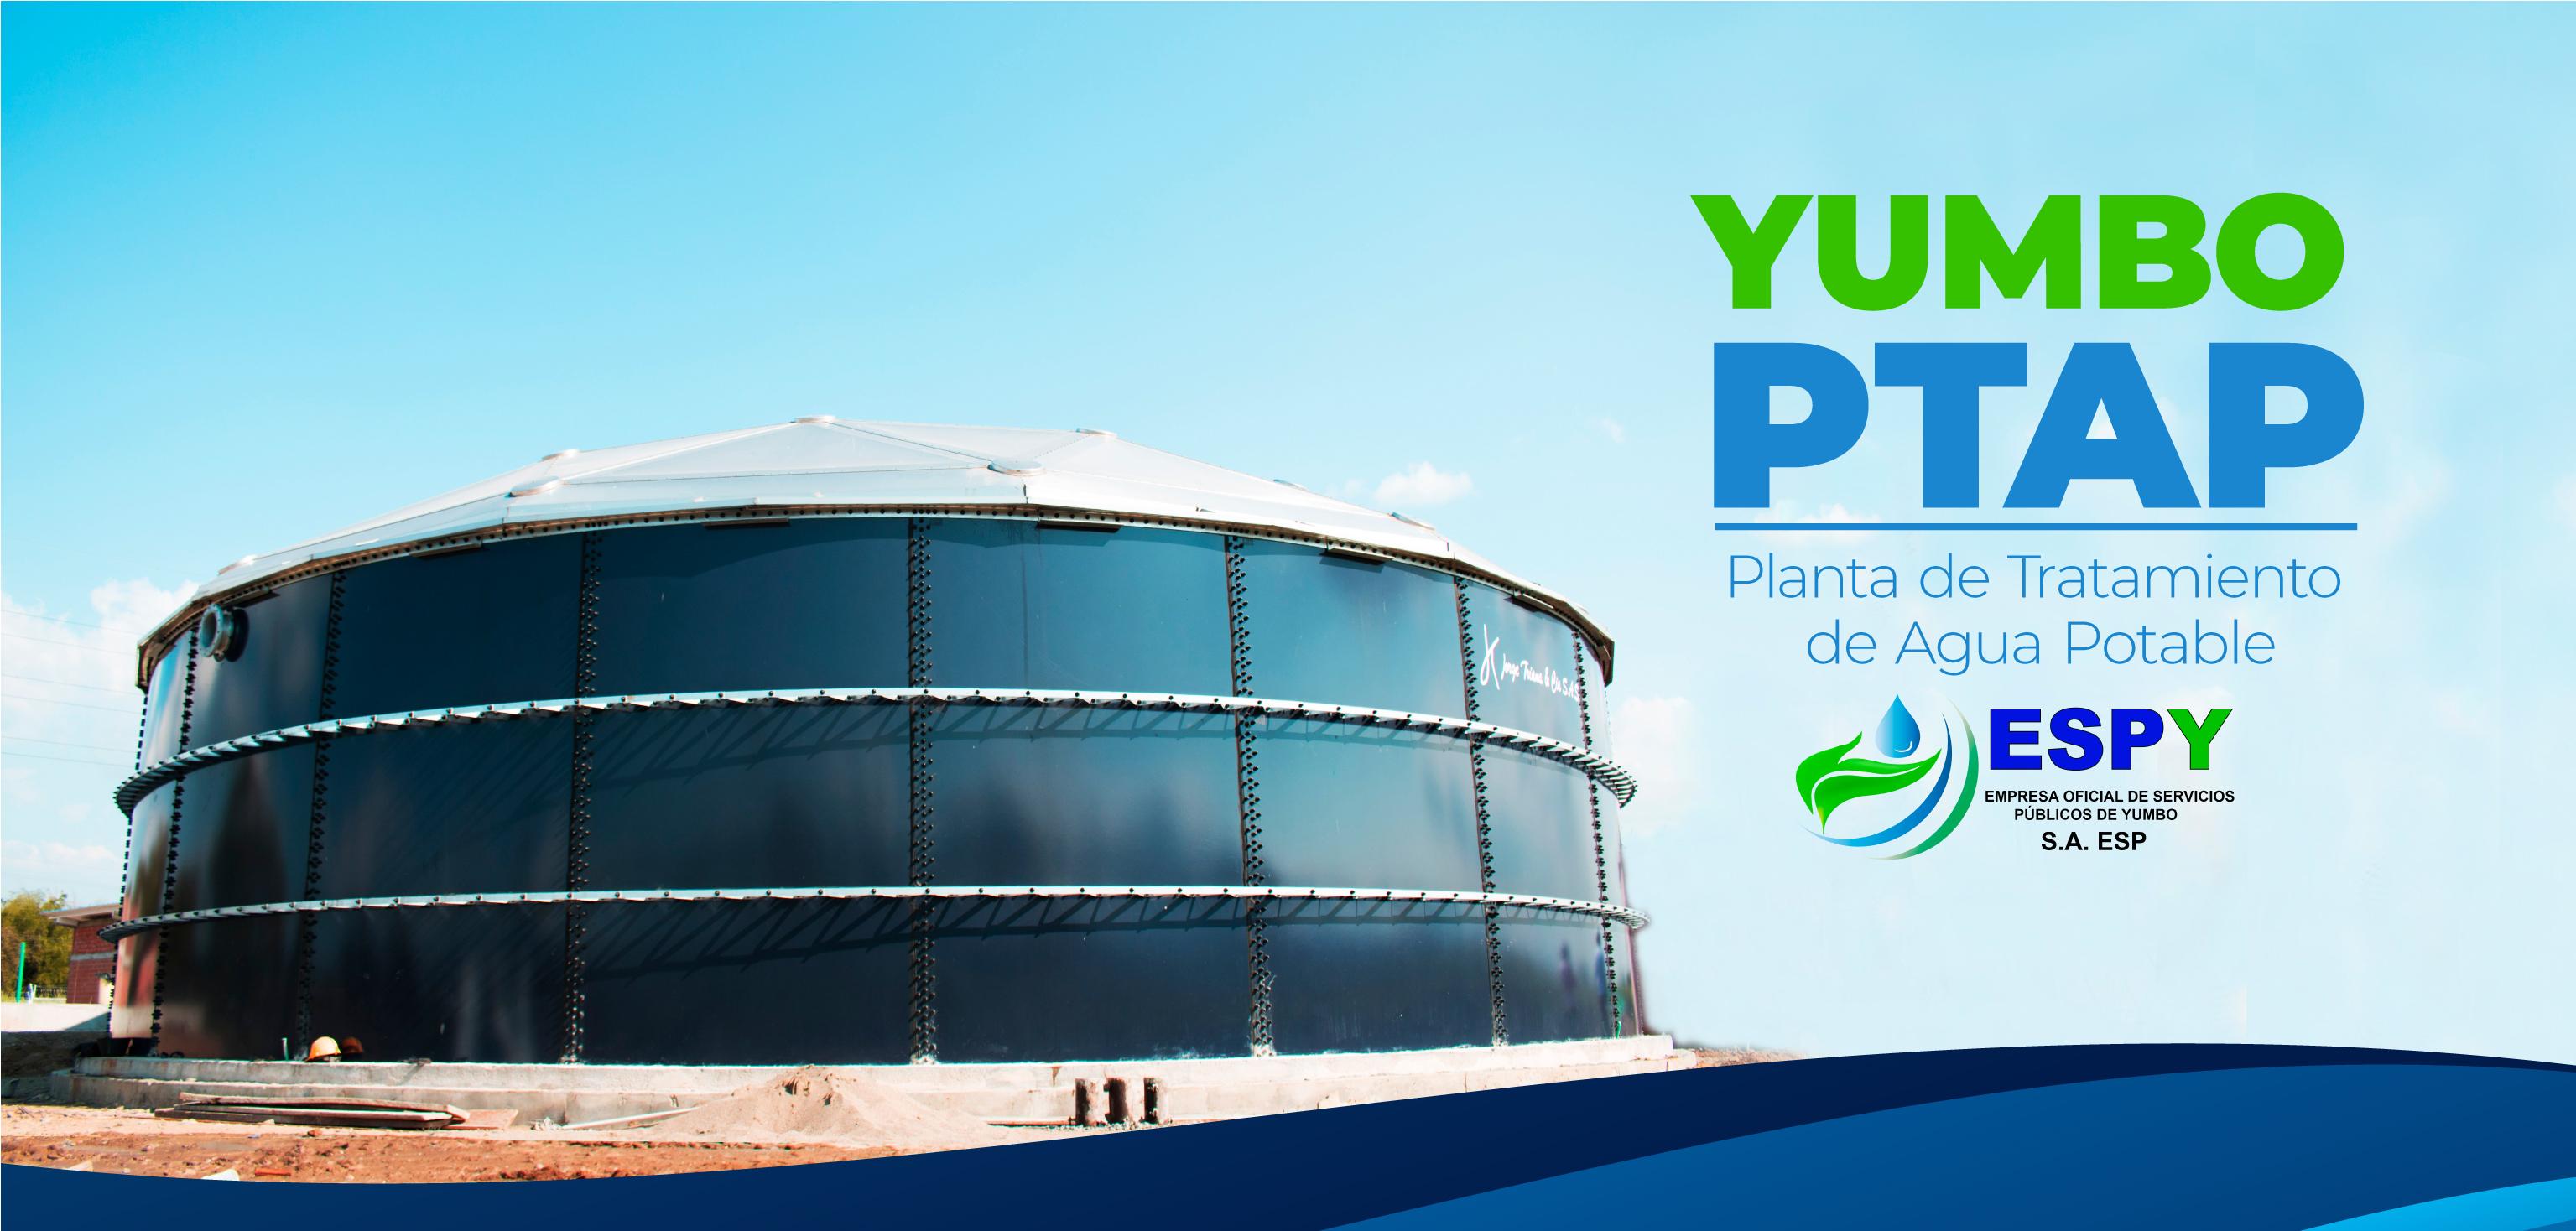 Yumbo-ptap-planta-de-tratamiento-de-agua-potable